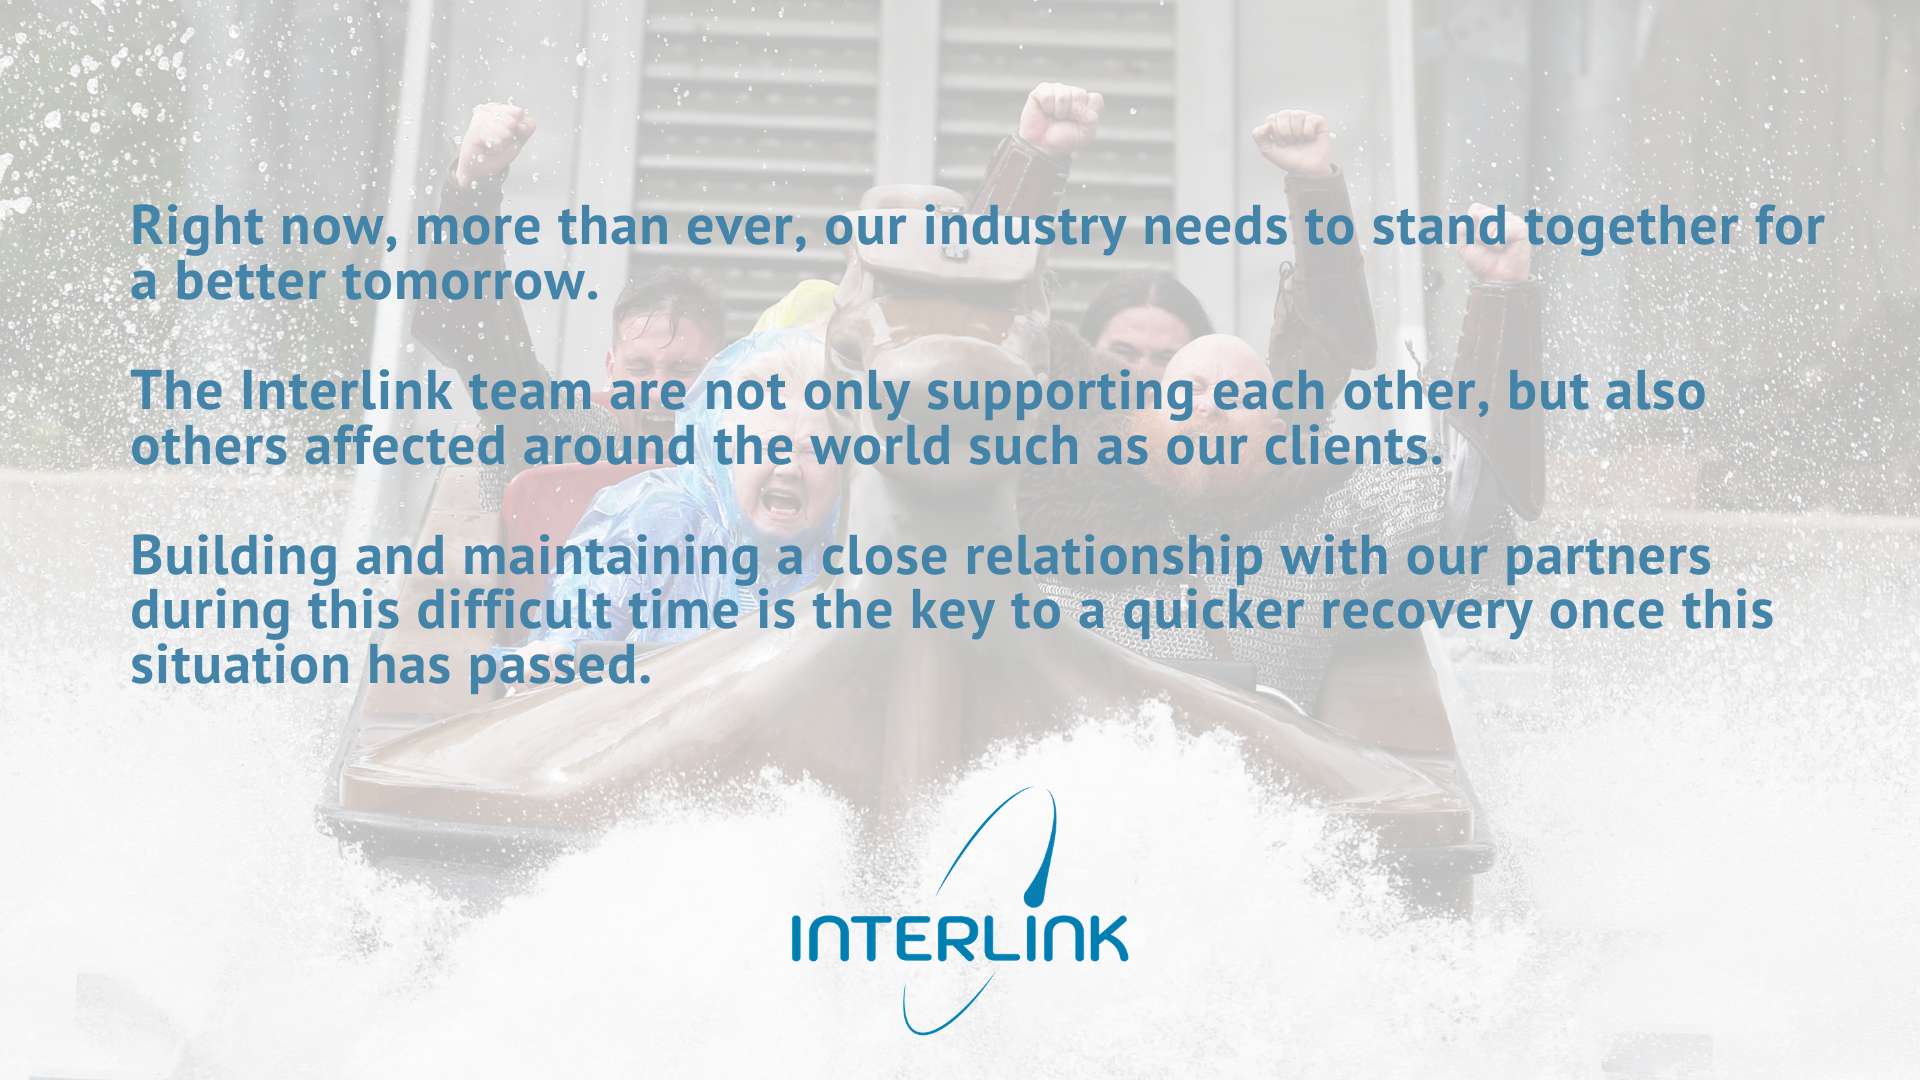 Interlink Solidarity post